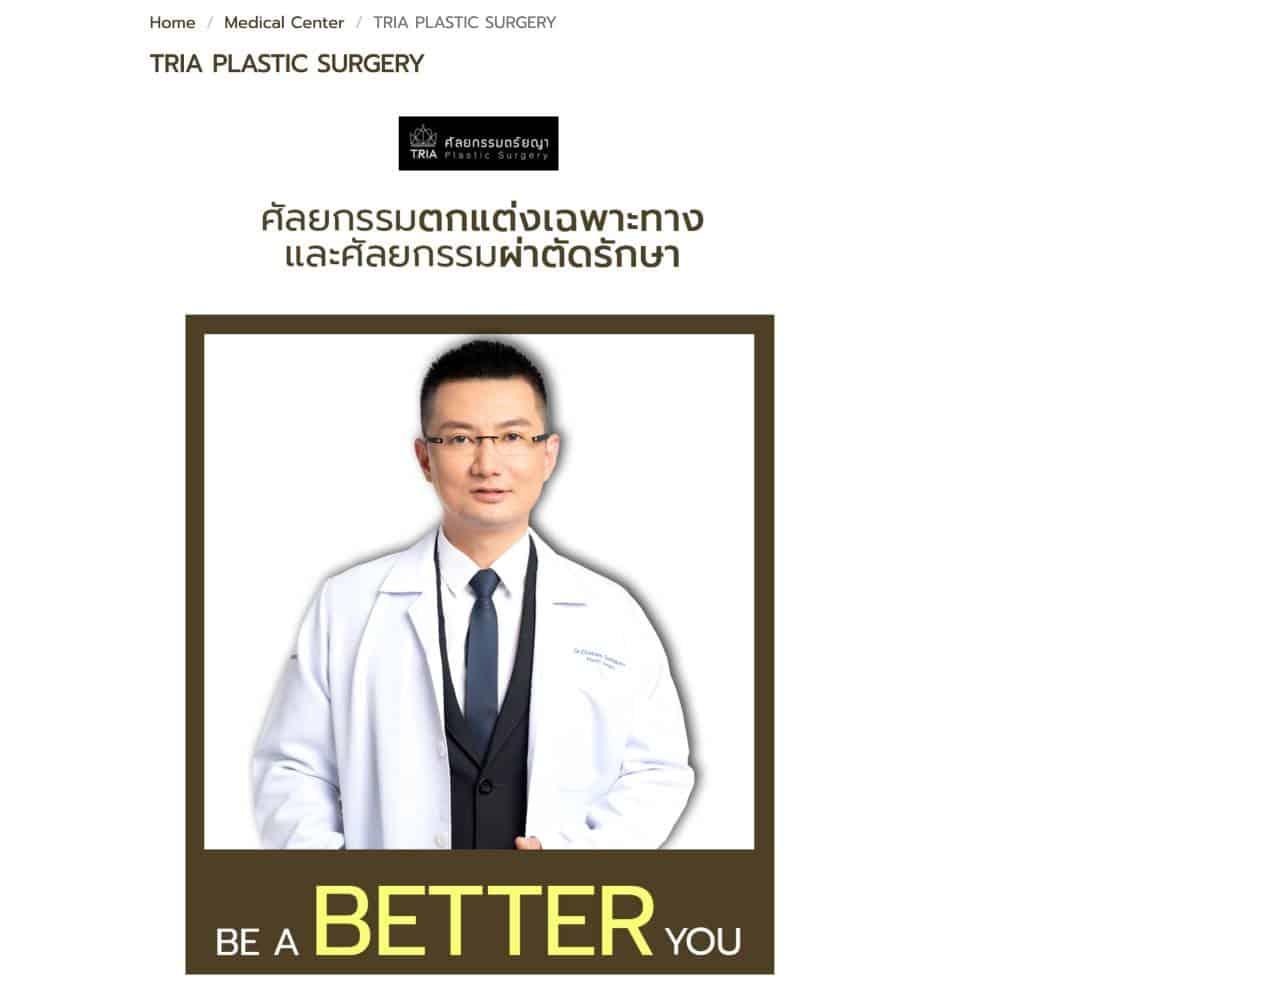 Tria plastic surgery. Bangkok Thailand - 92653 2